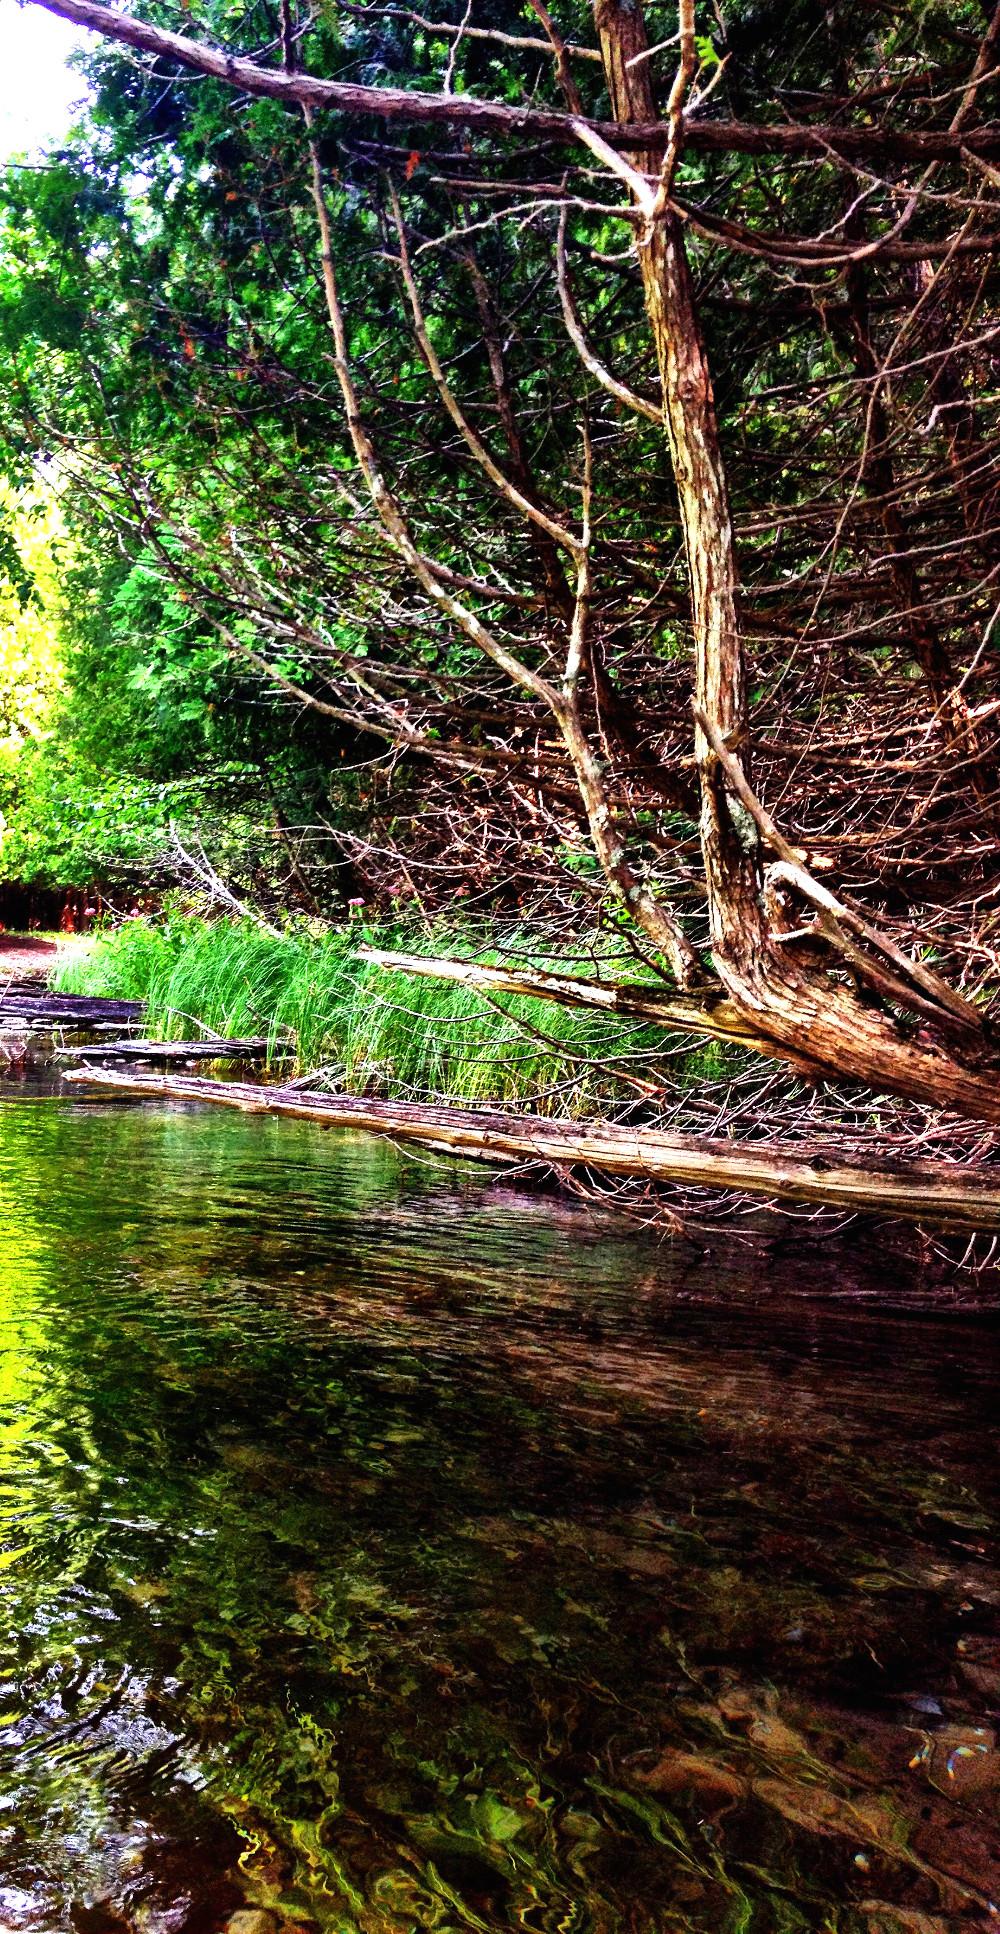 Scenery on Crystal River Glen Arbor Double-Barrelled Travel